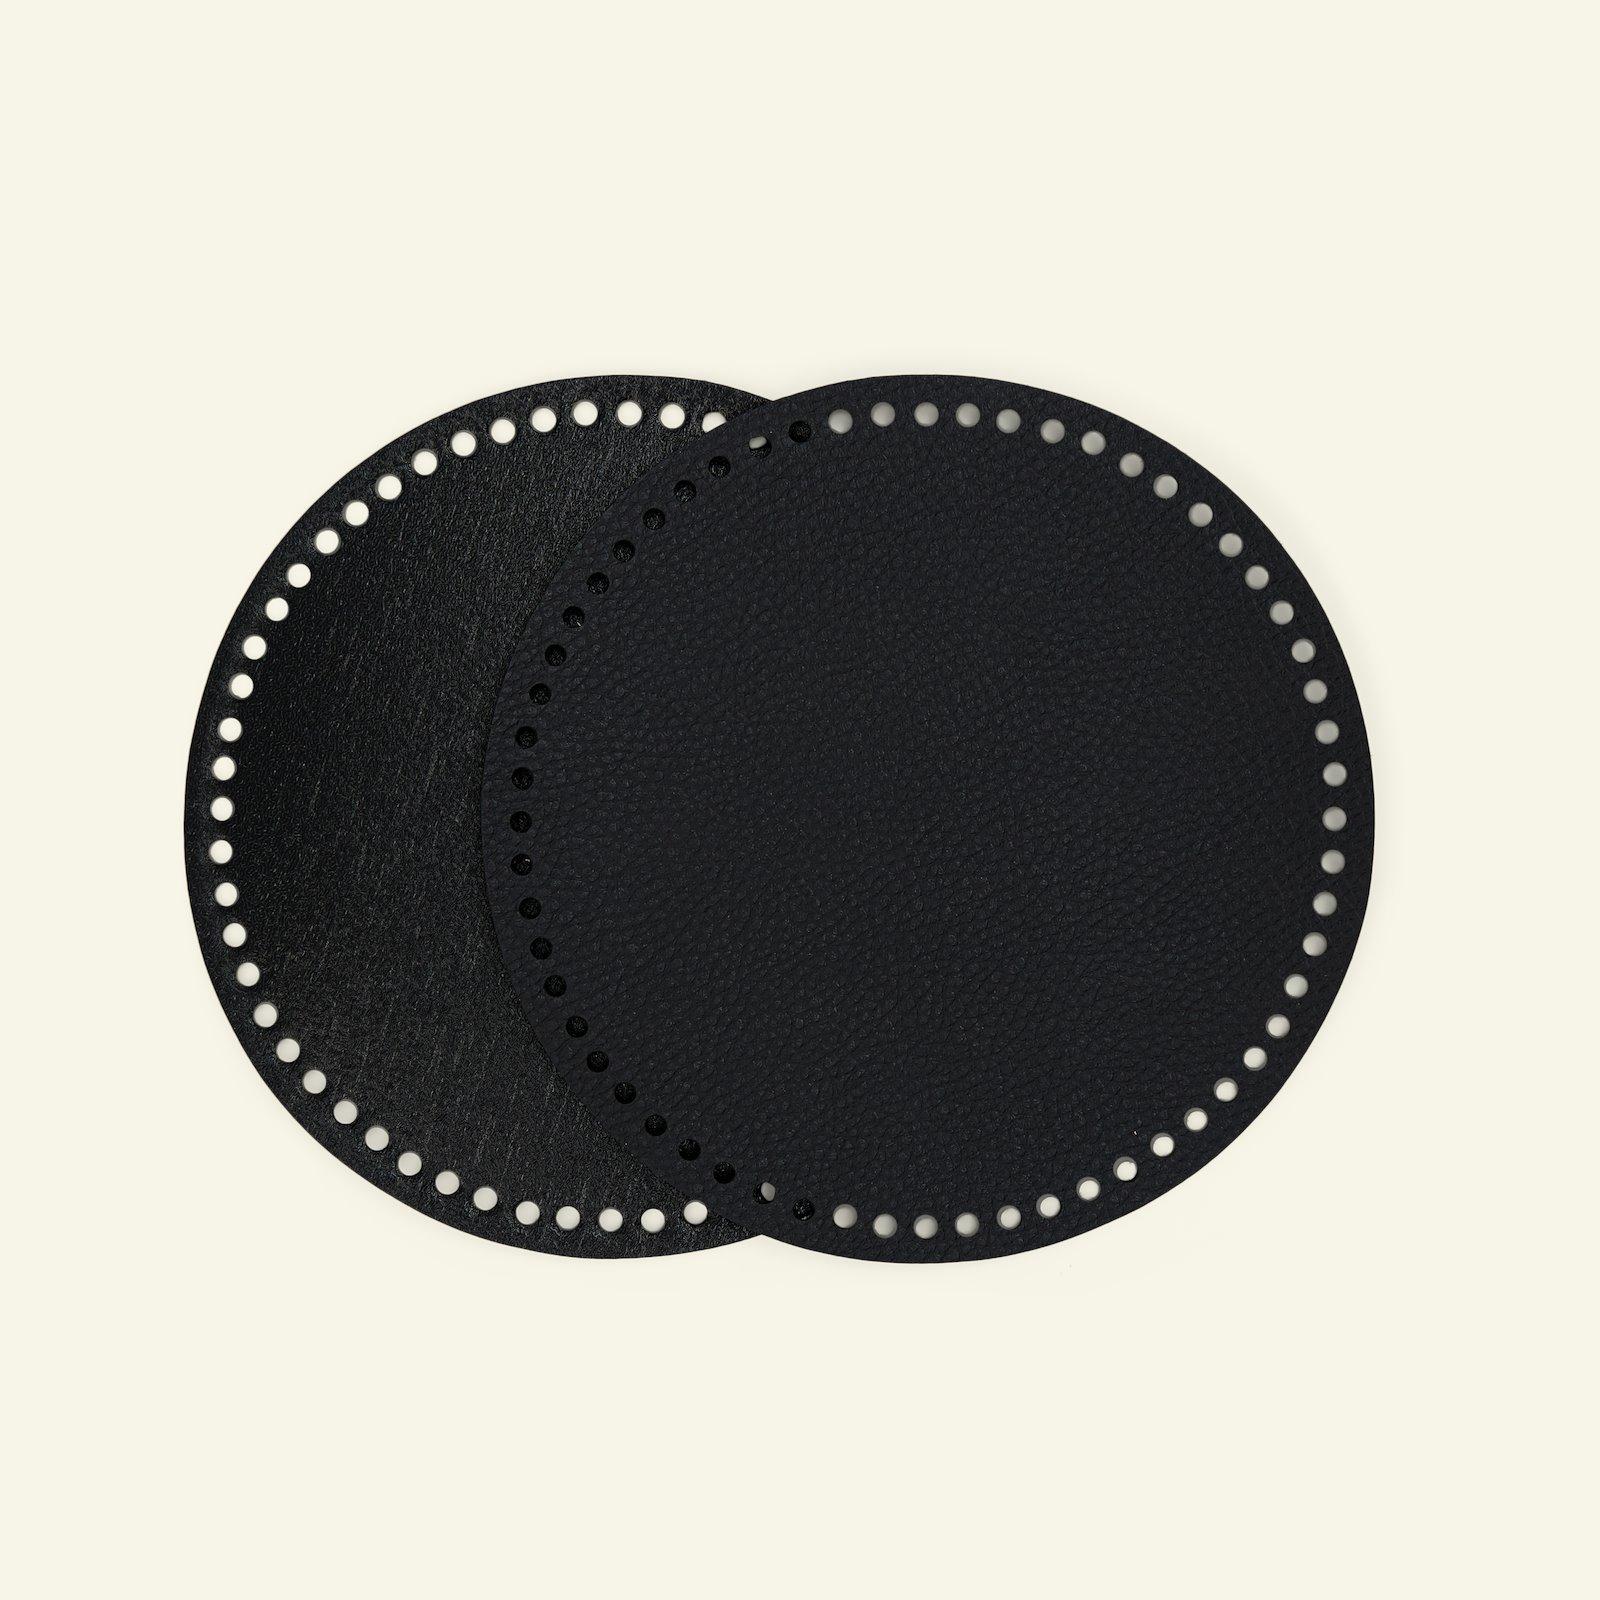 FRAYA bag/basket bottom 20cm black 1pc 83311_pack